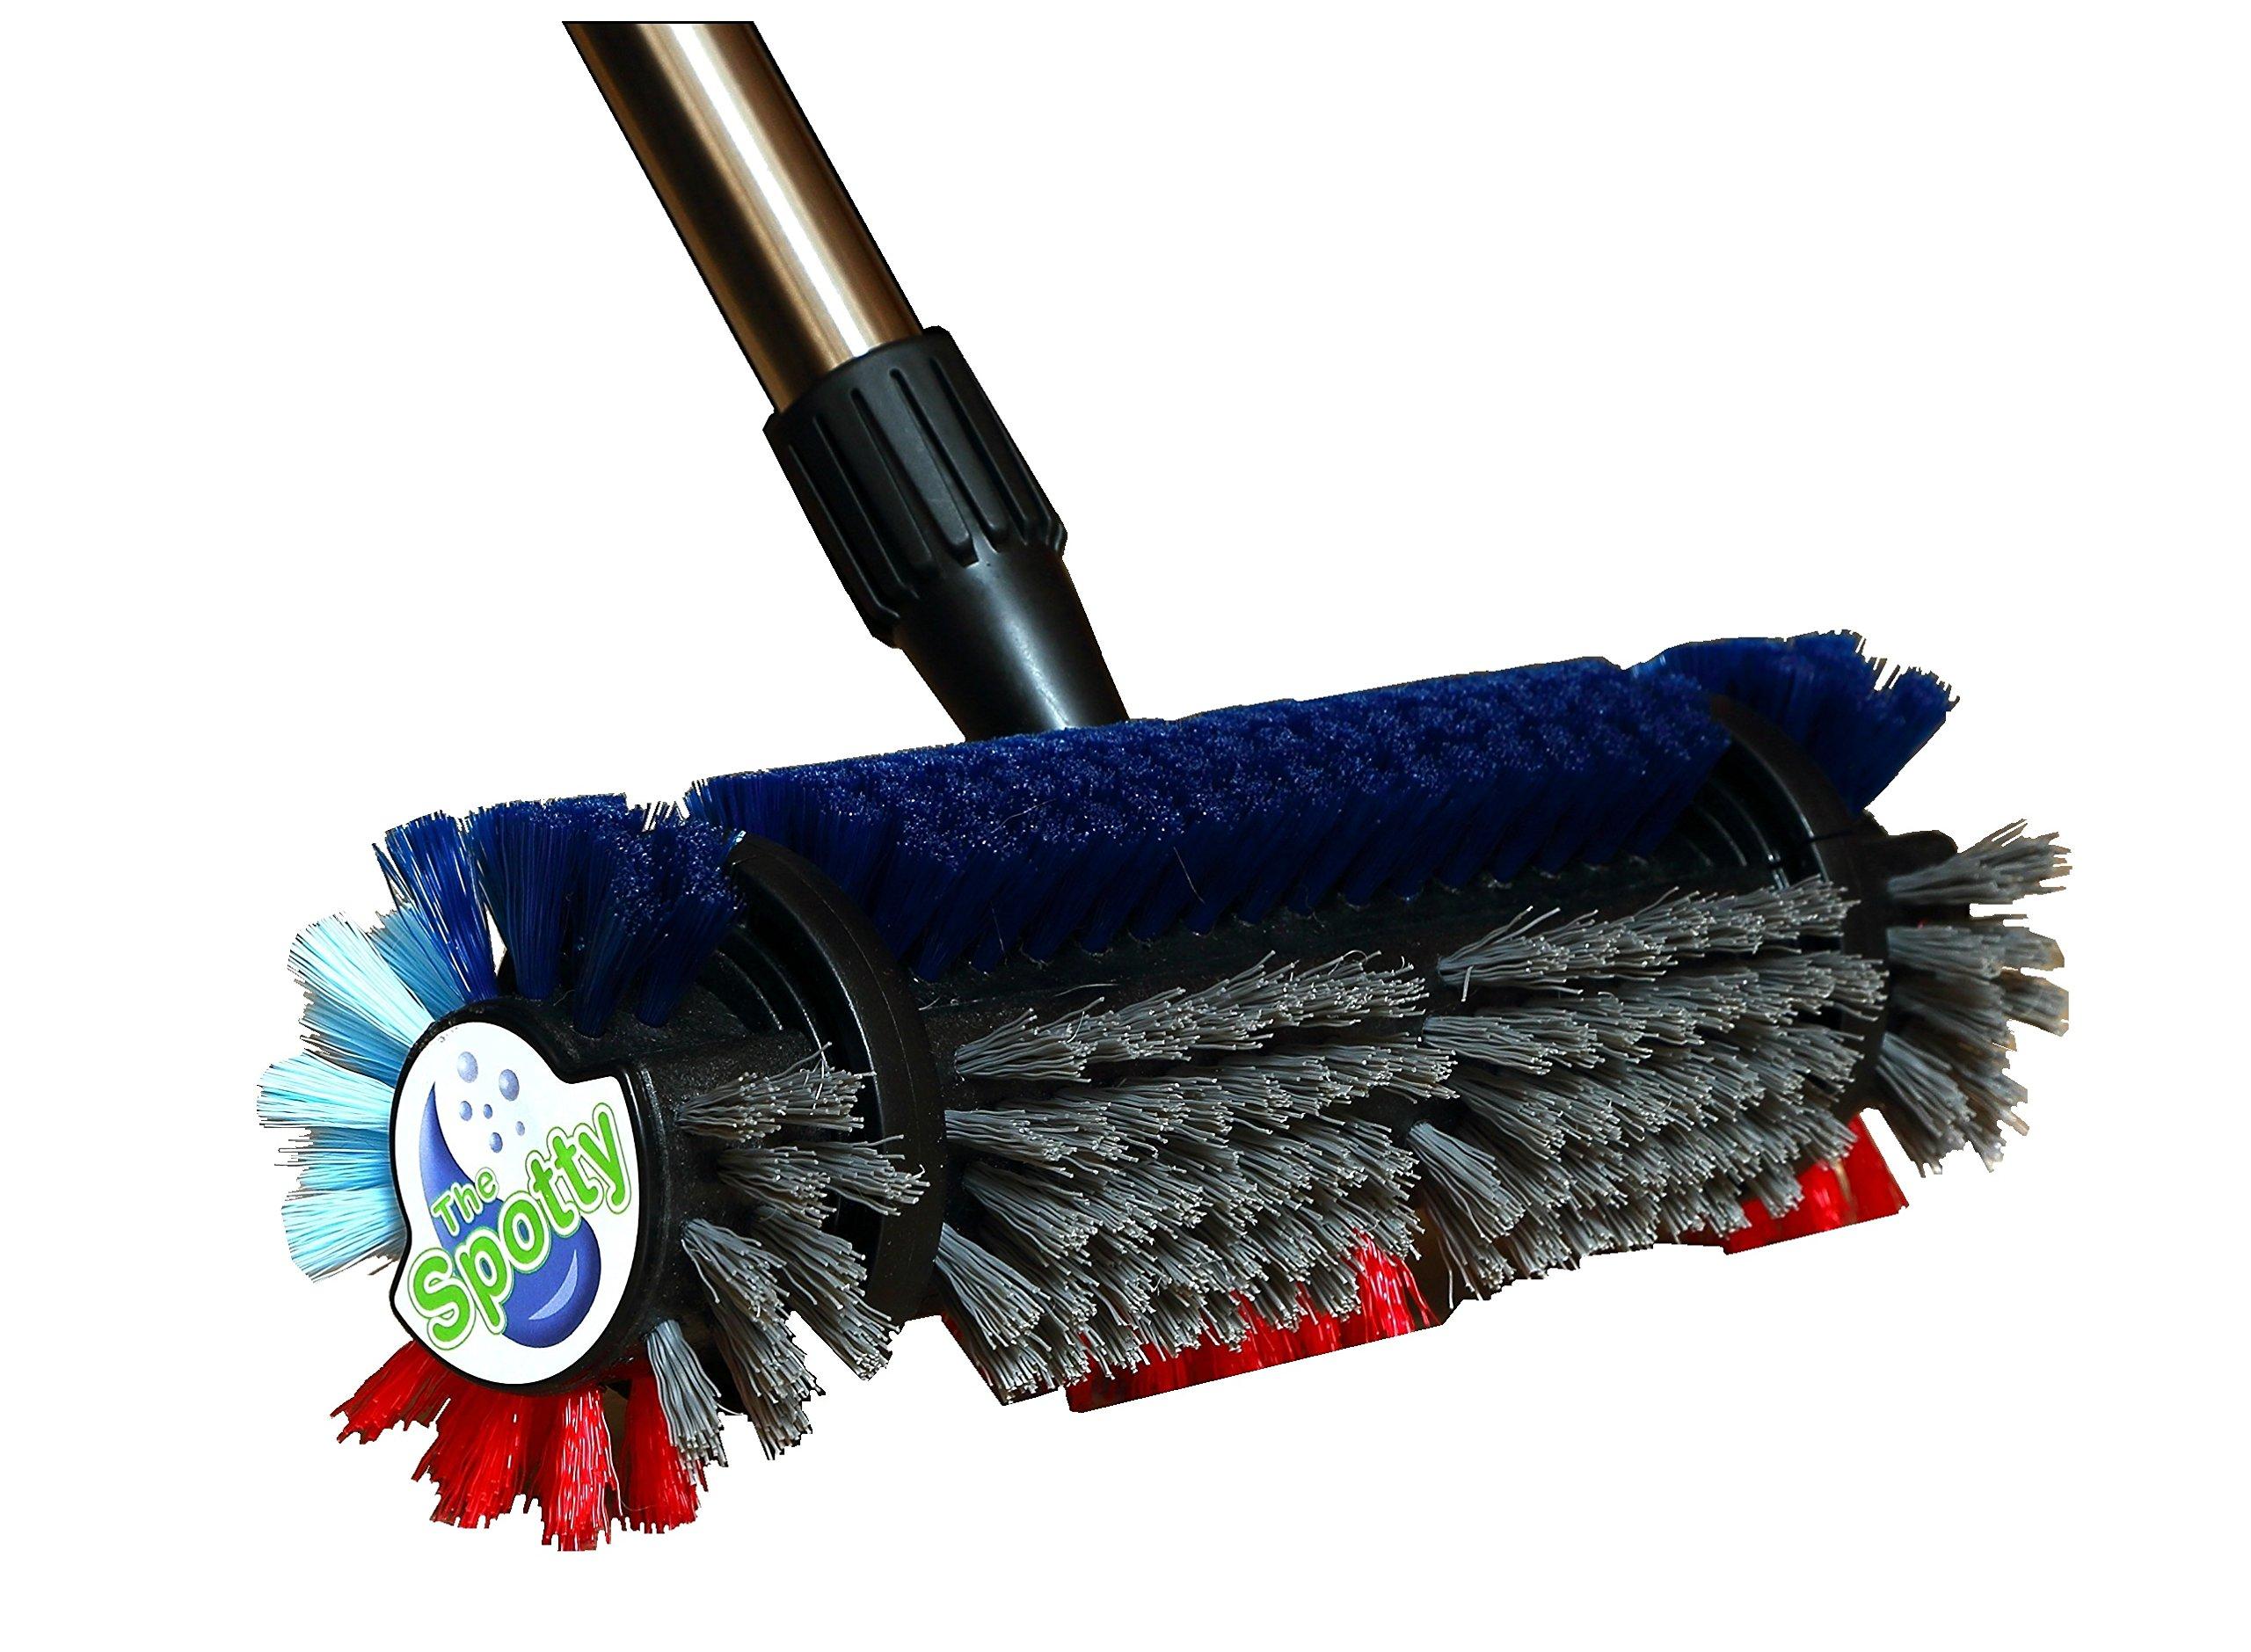 The SPOTTY™ ~ Carpet & Tile Cleaning Brush